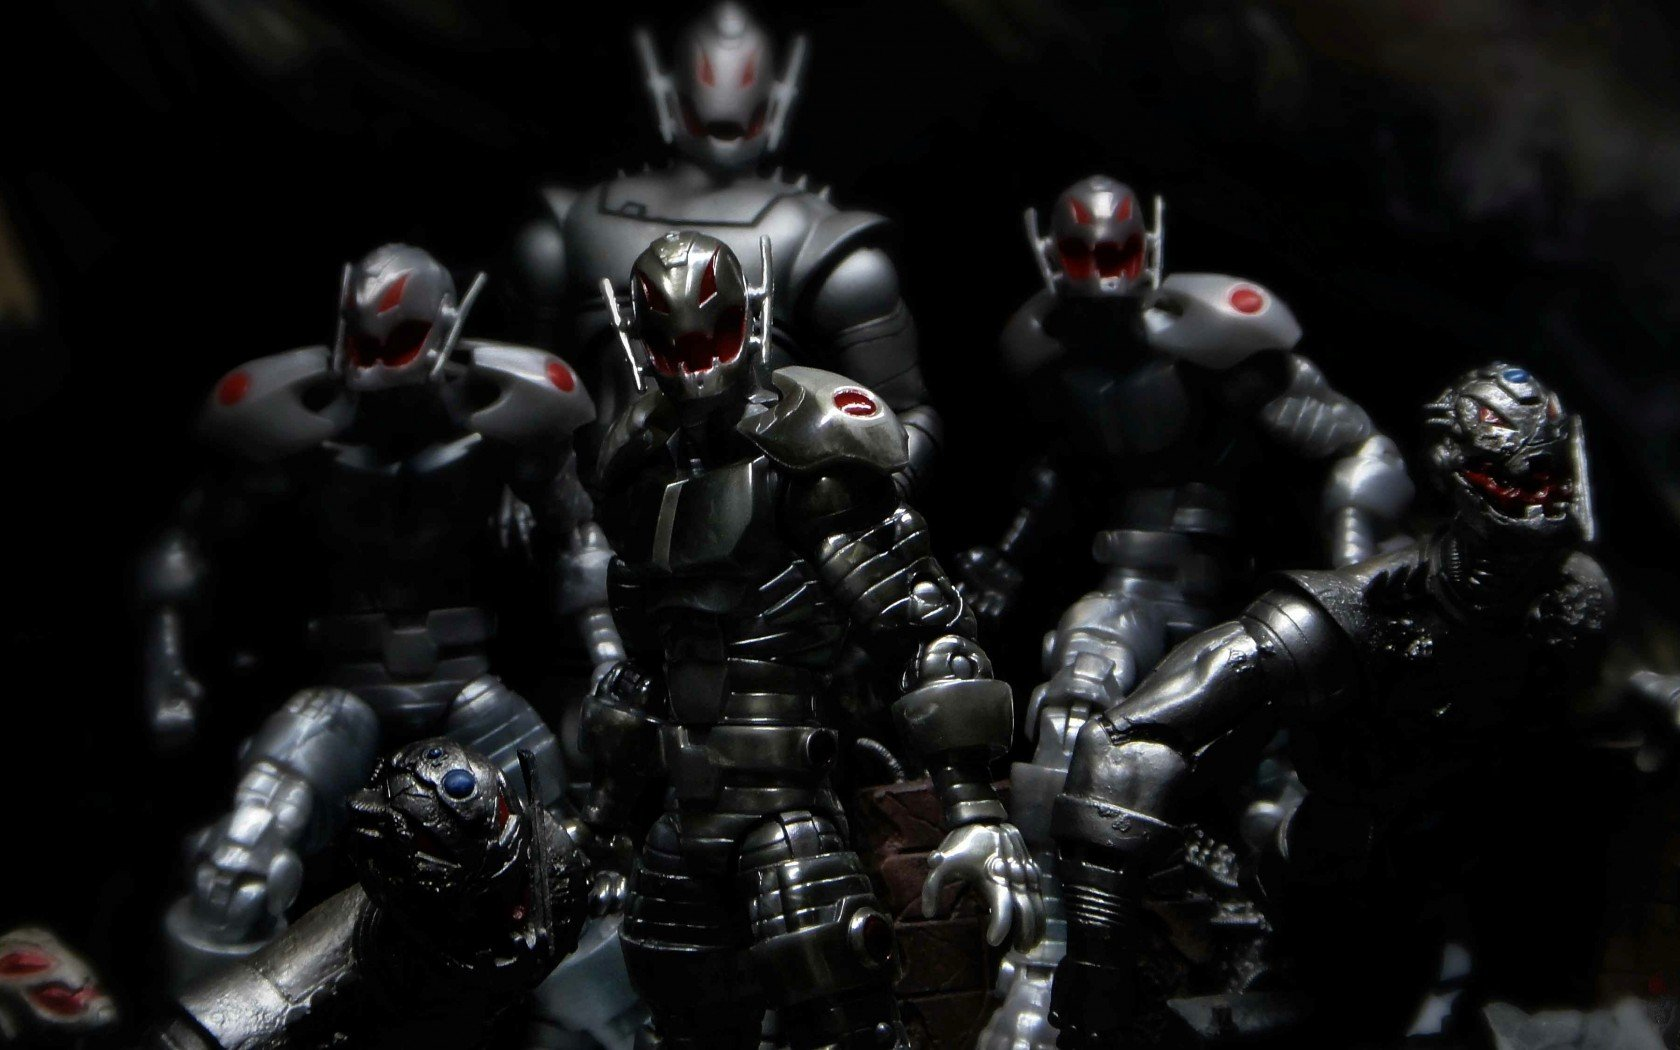 Avengers age ultron marvel superhero action adventure - Avengers superhero wallpaper ...